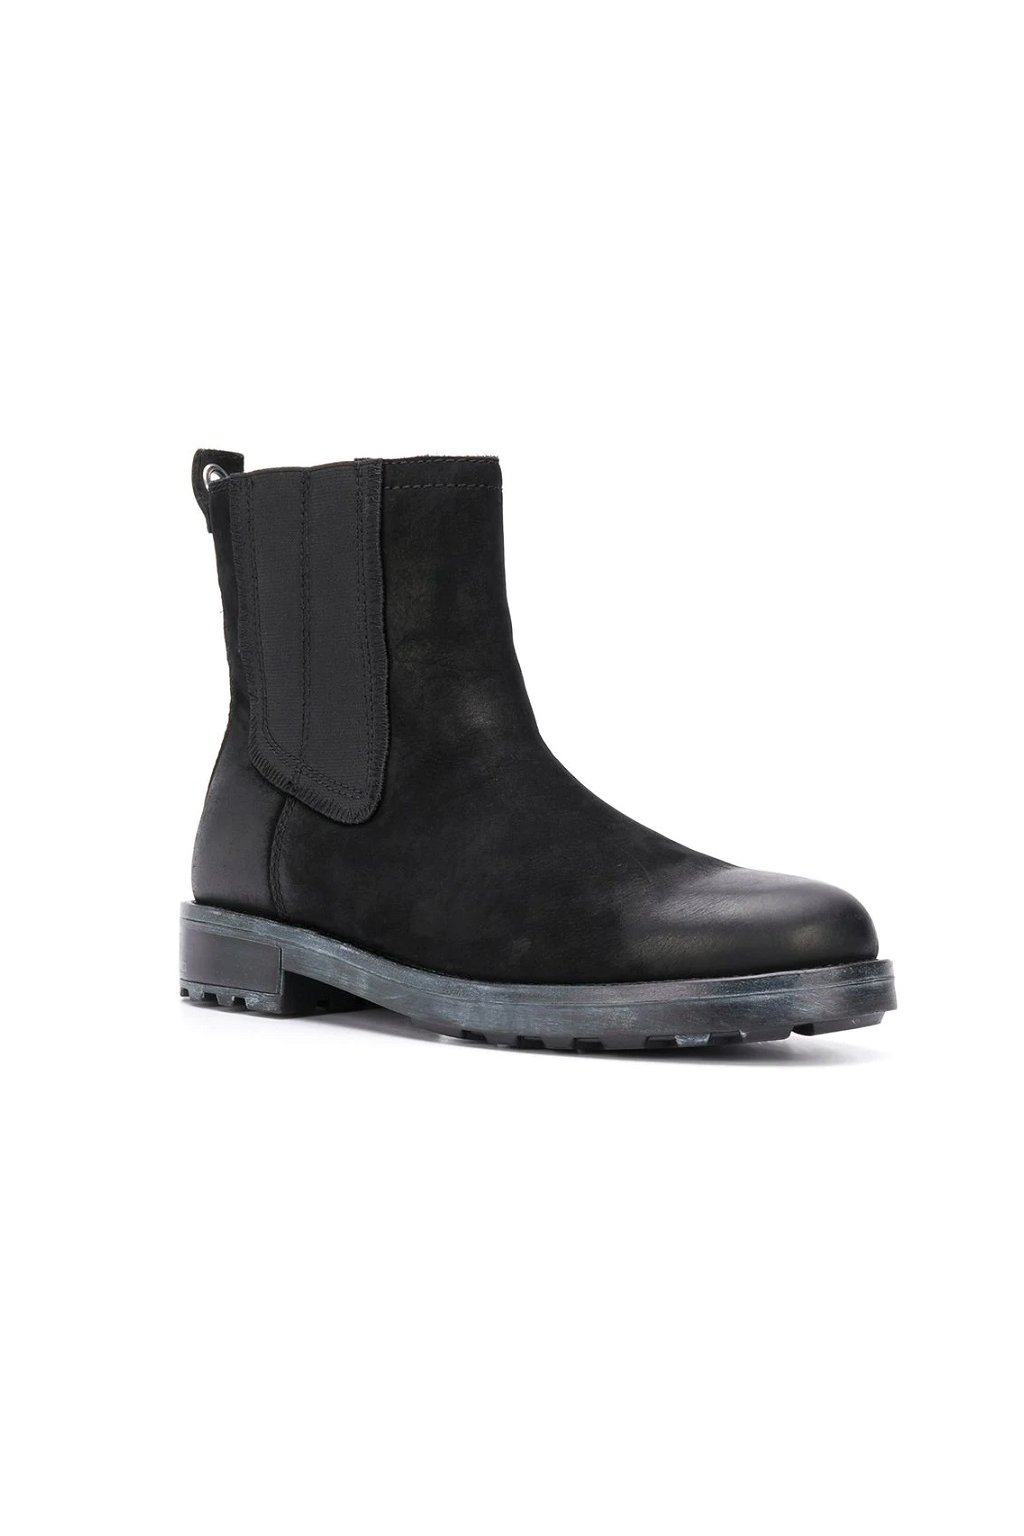 Y02476 PS066 T8013 Pánská obuv Diesel D-throuper Ch černá